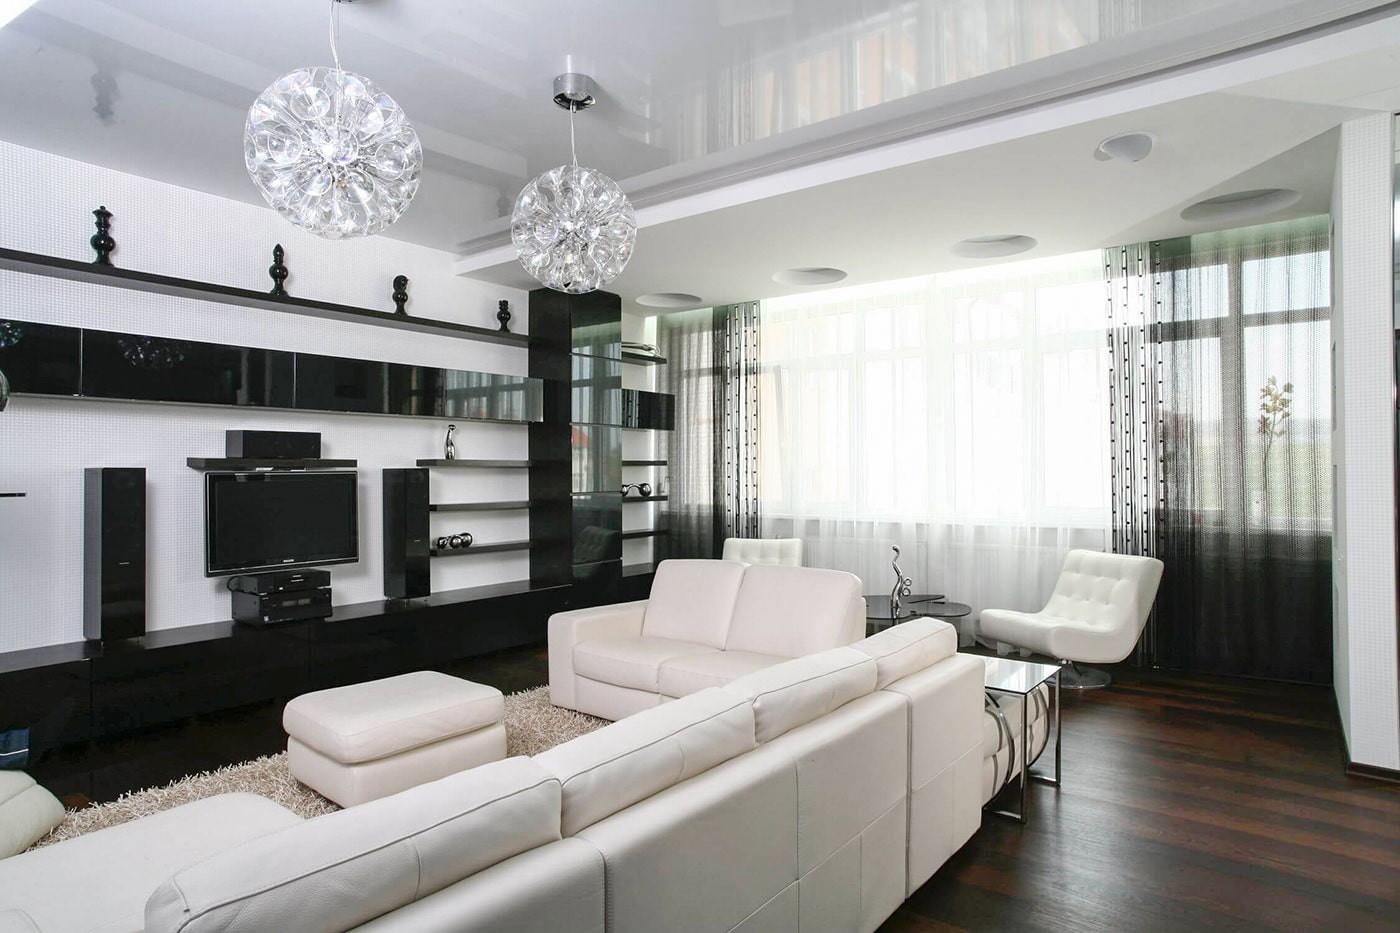 черно белая квартира идеи дизайна